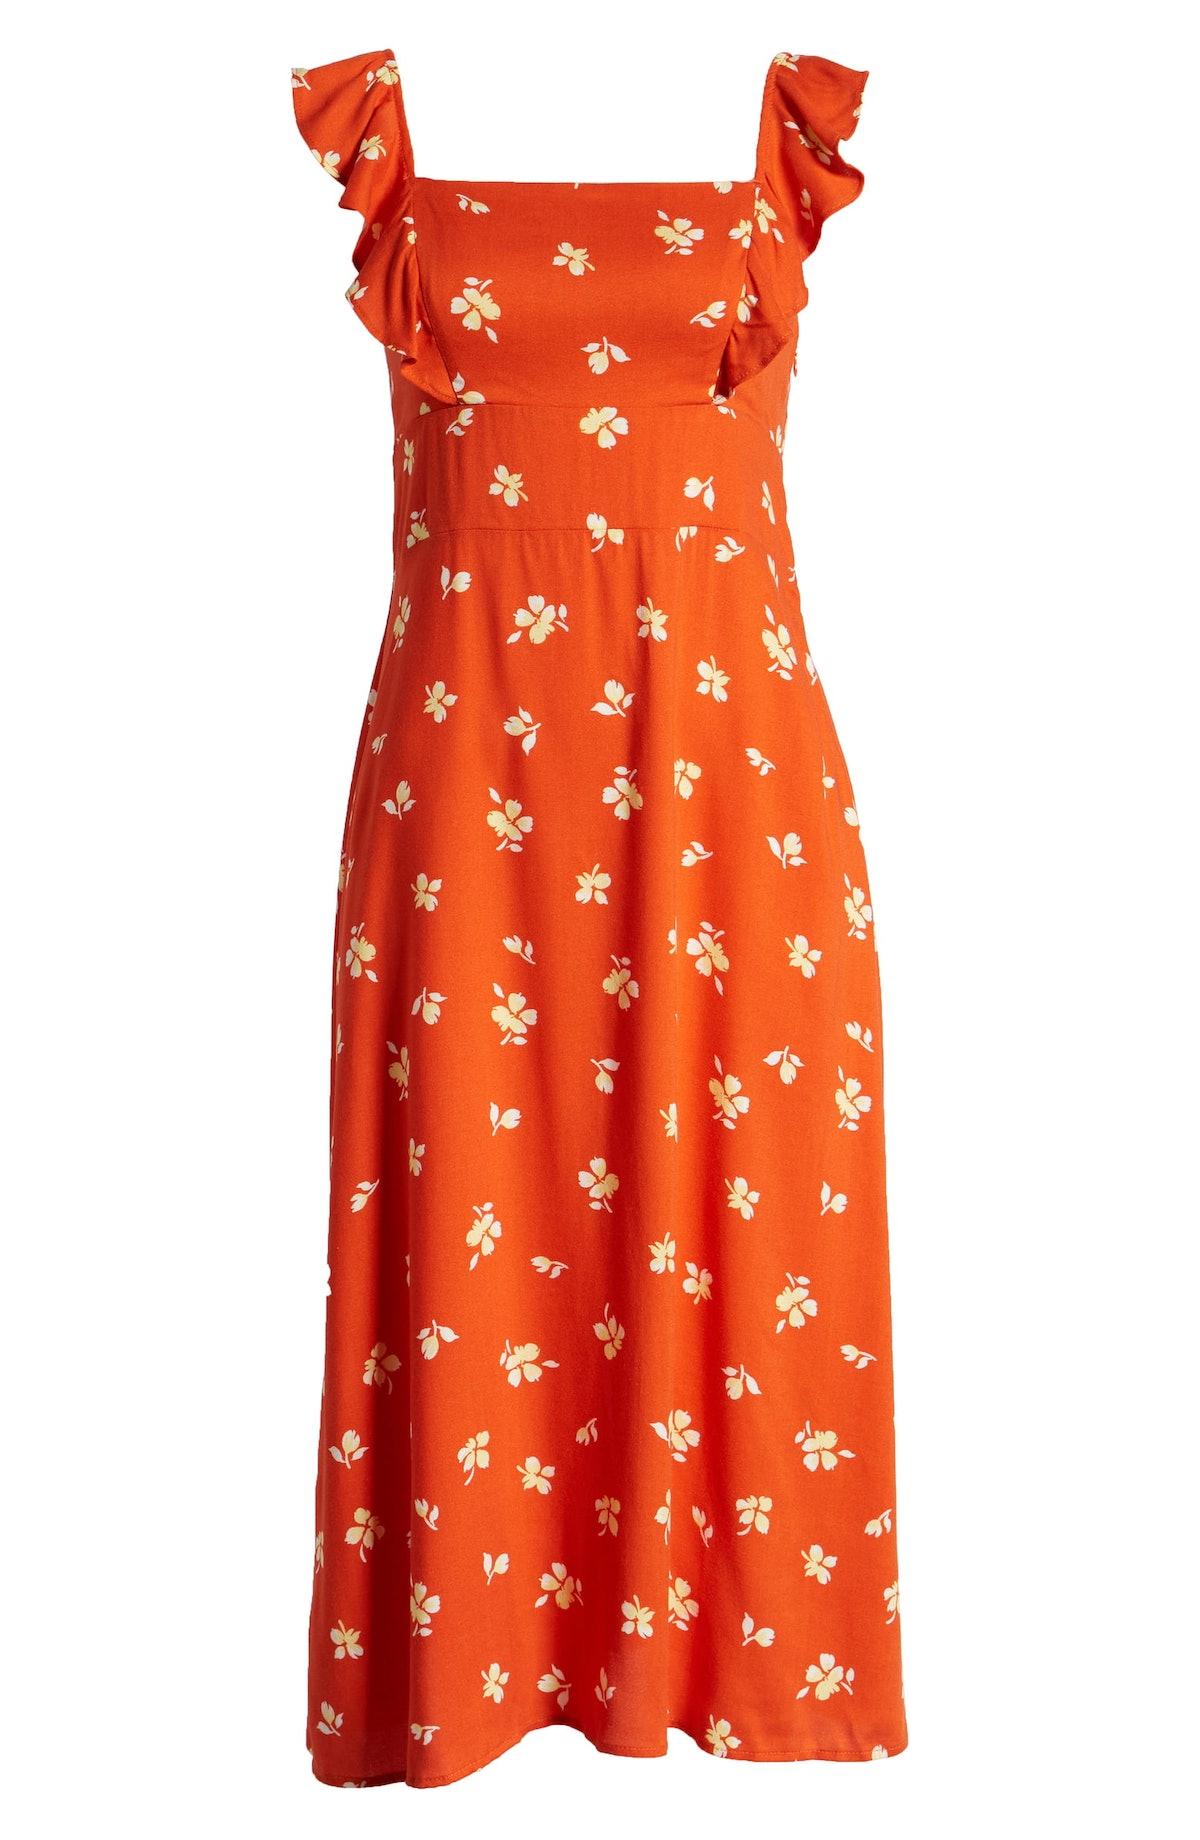 Leith Ruffle Front Square Neck Midi Dress